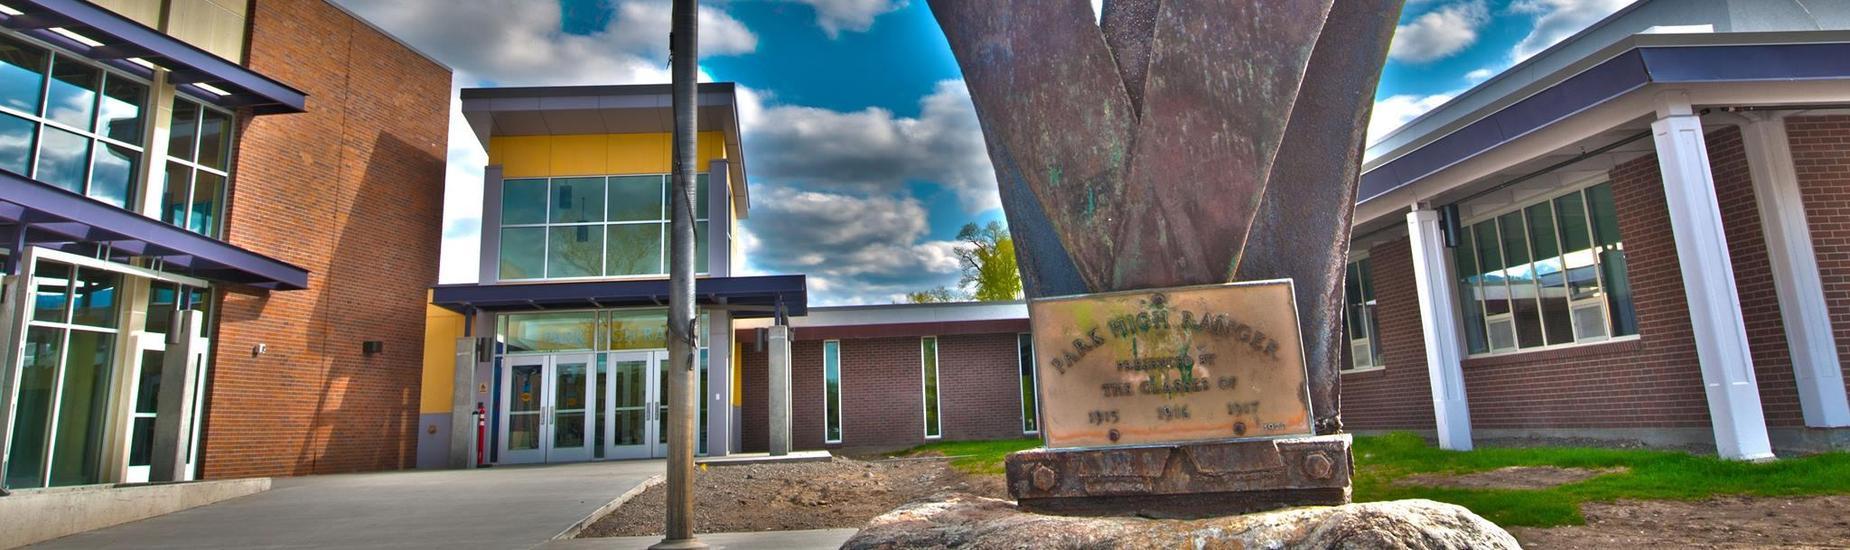 Entrance of Park High School